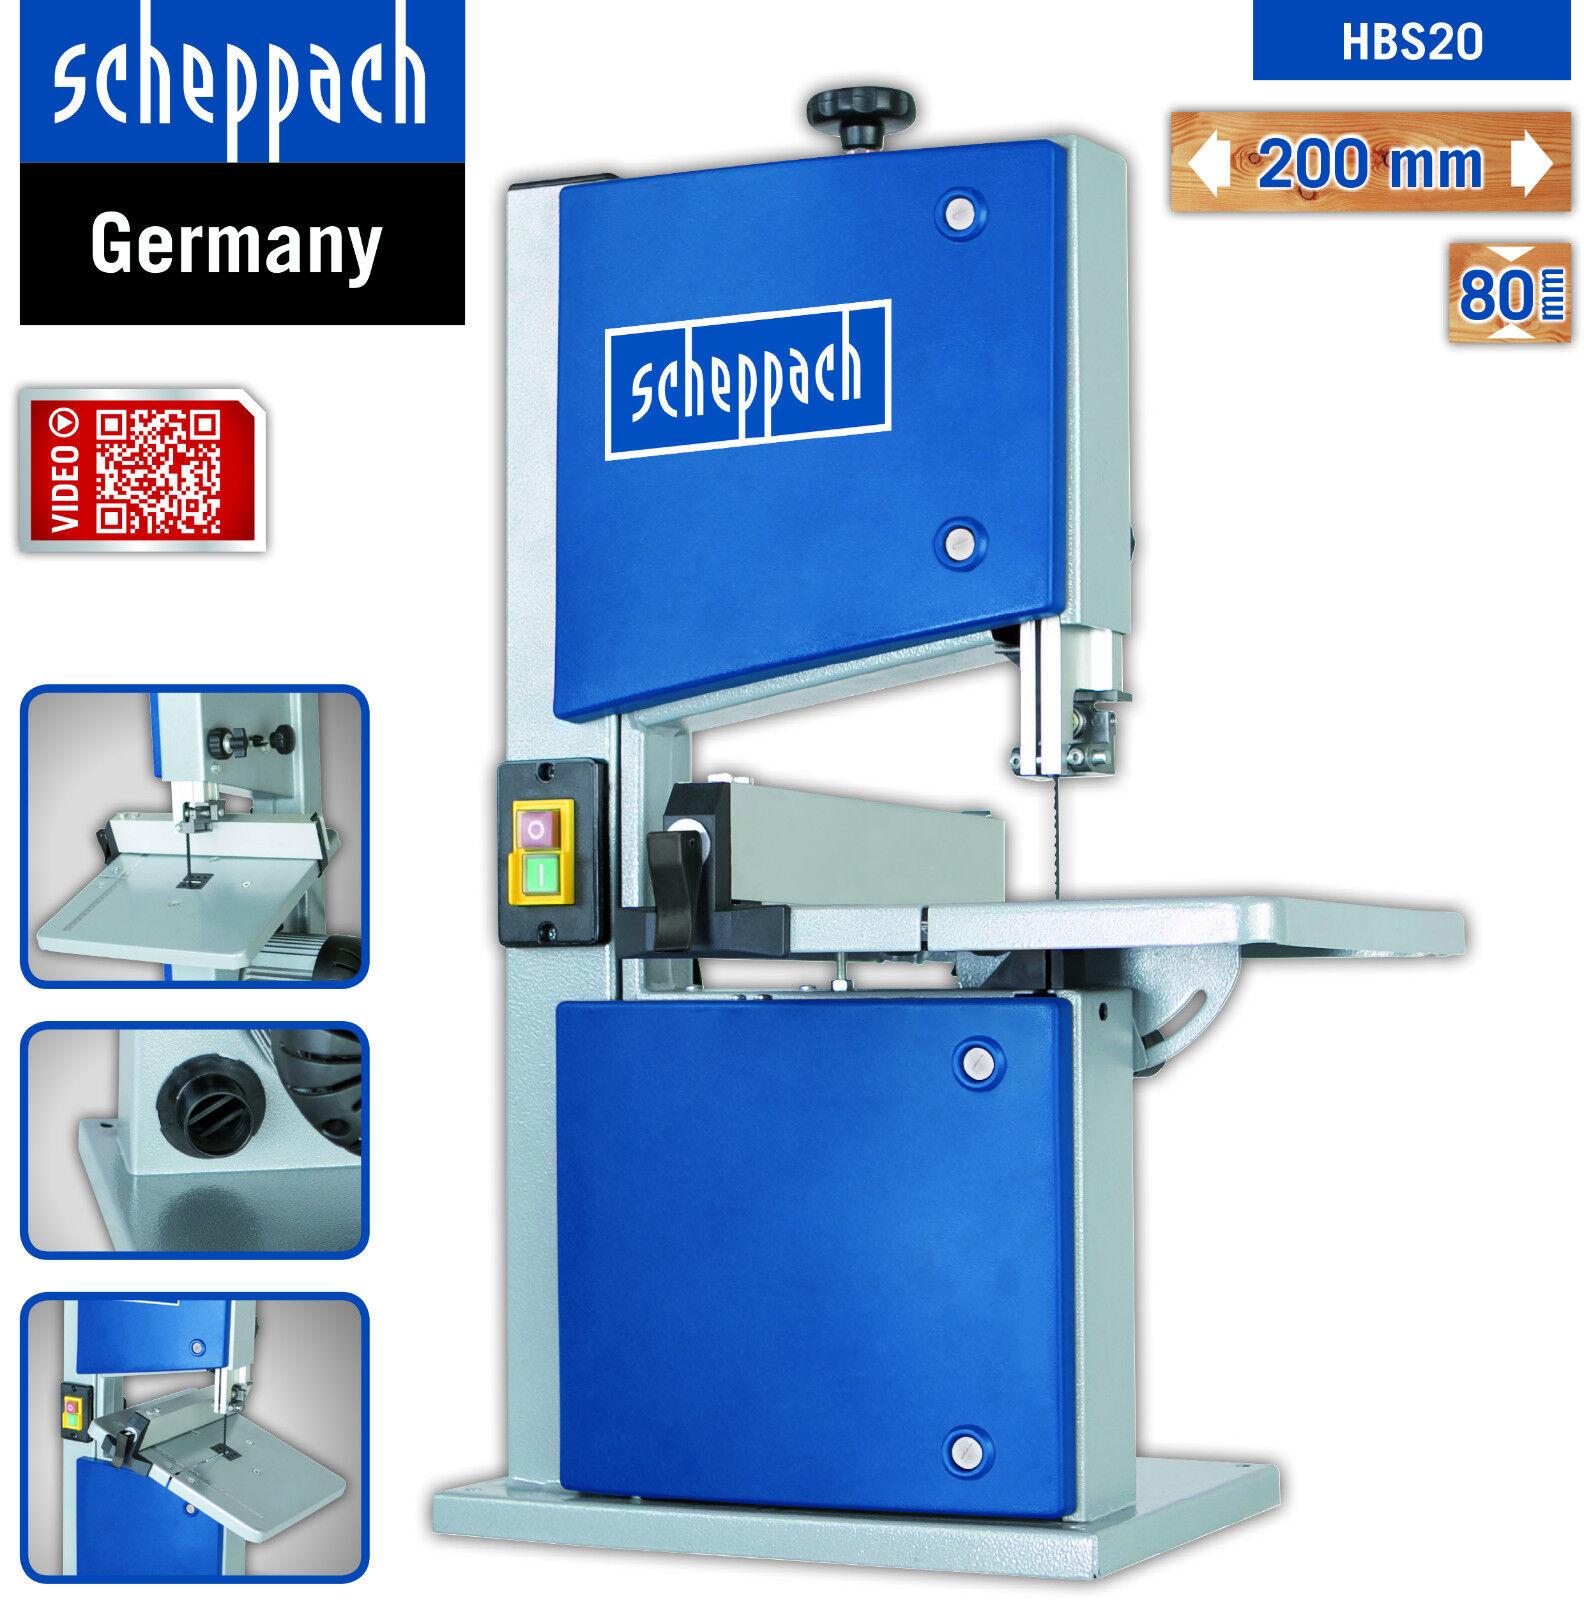 Scheppach Bandsäge HBS20 230V Durchlass 200/80mm m. Sägeband 6mm, +Schiebestock